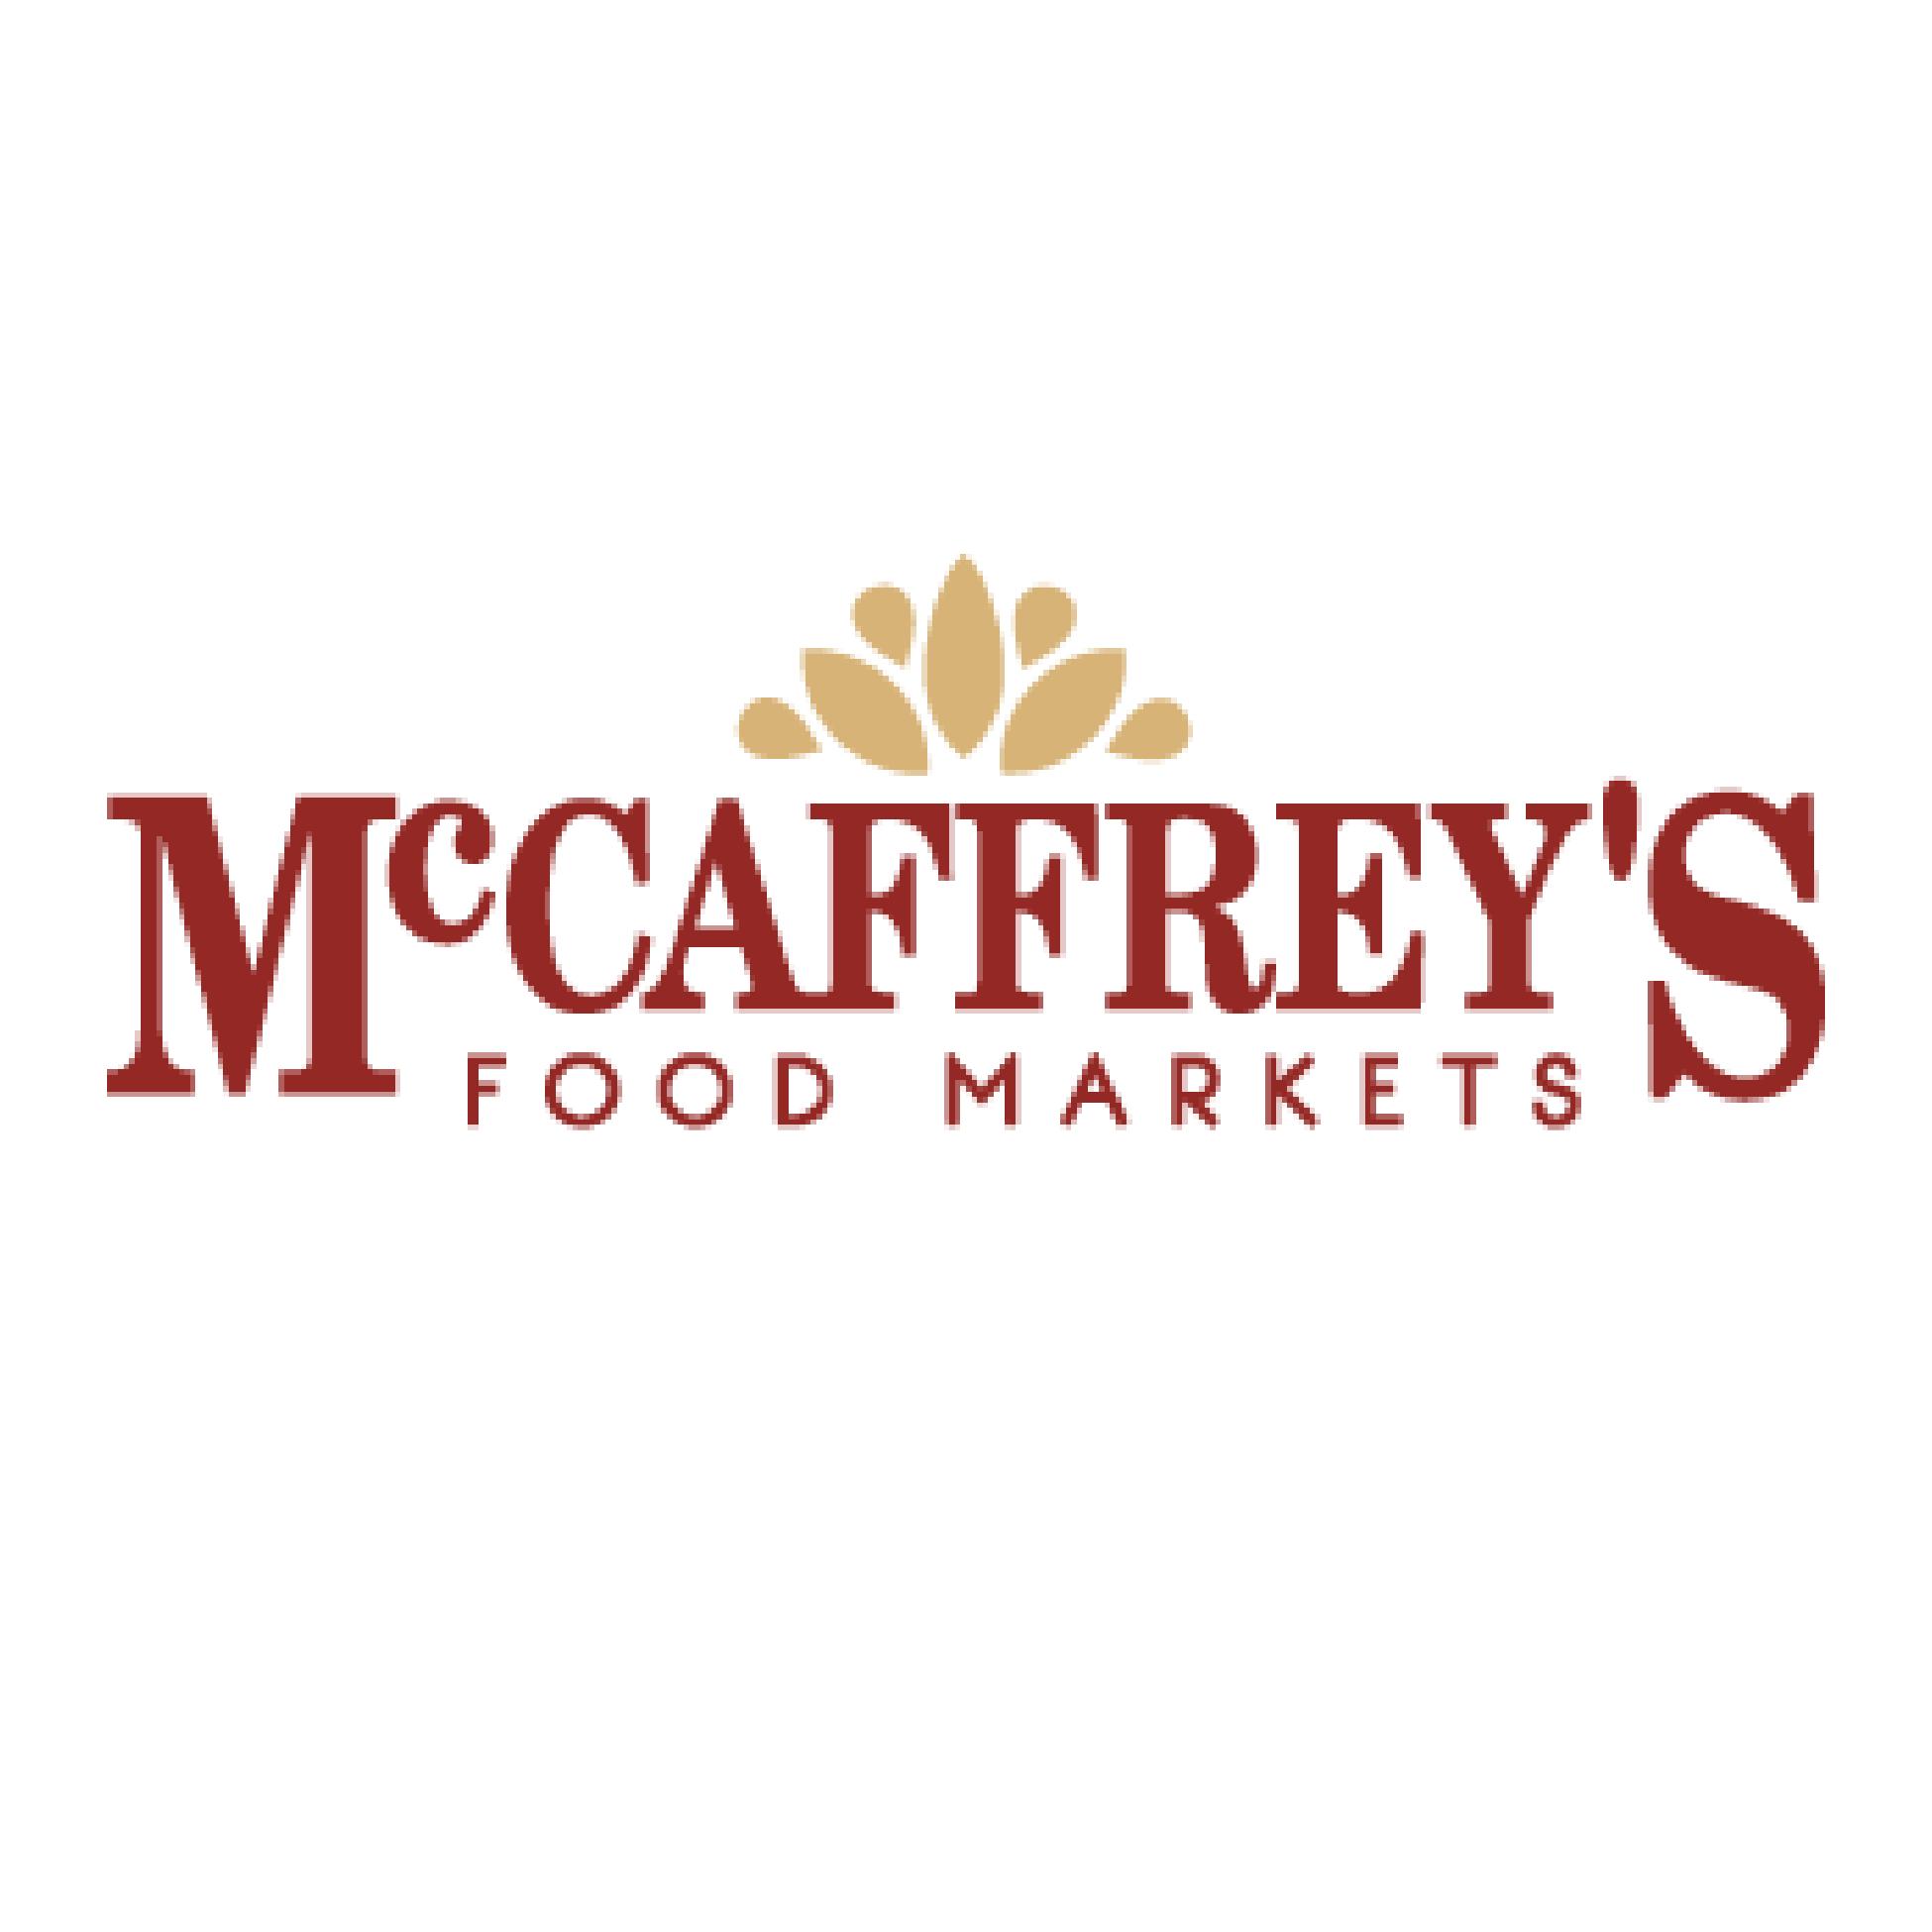 McCaffrey's logo